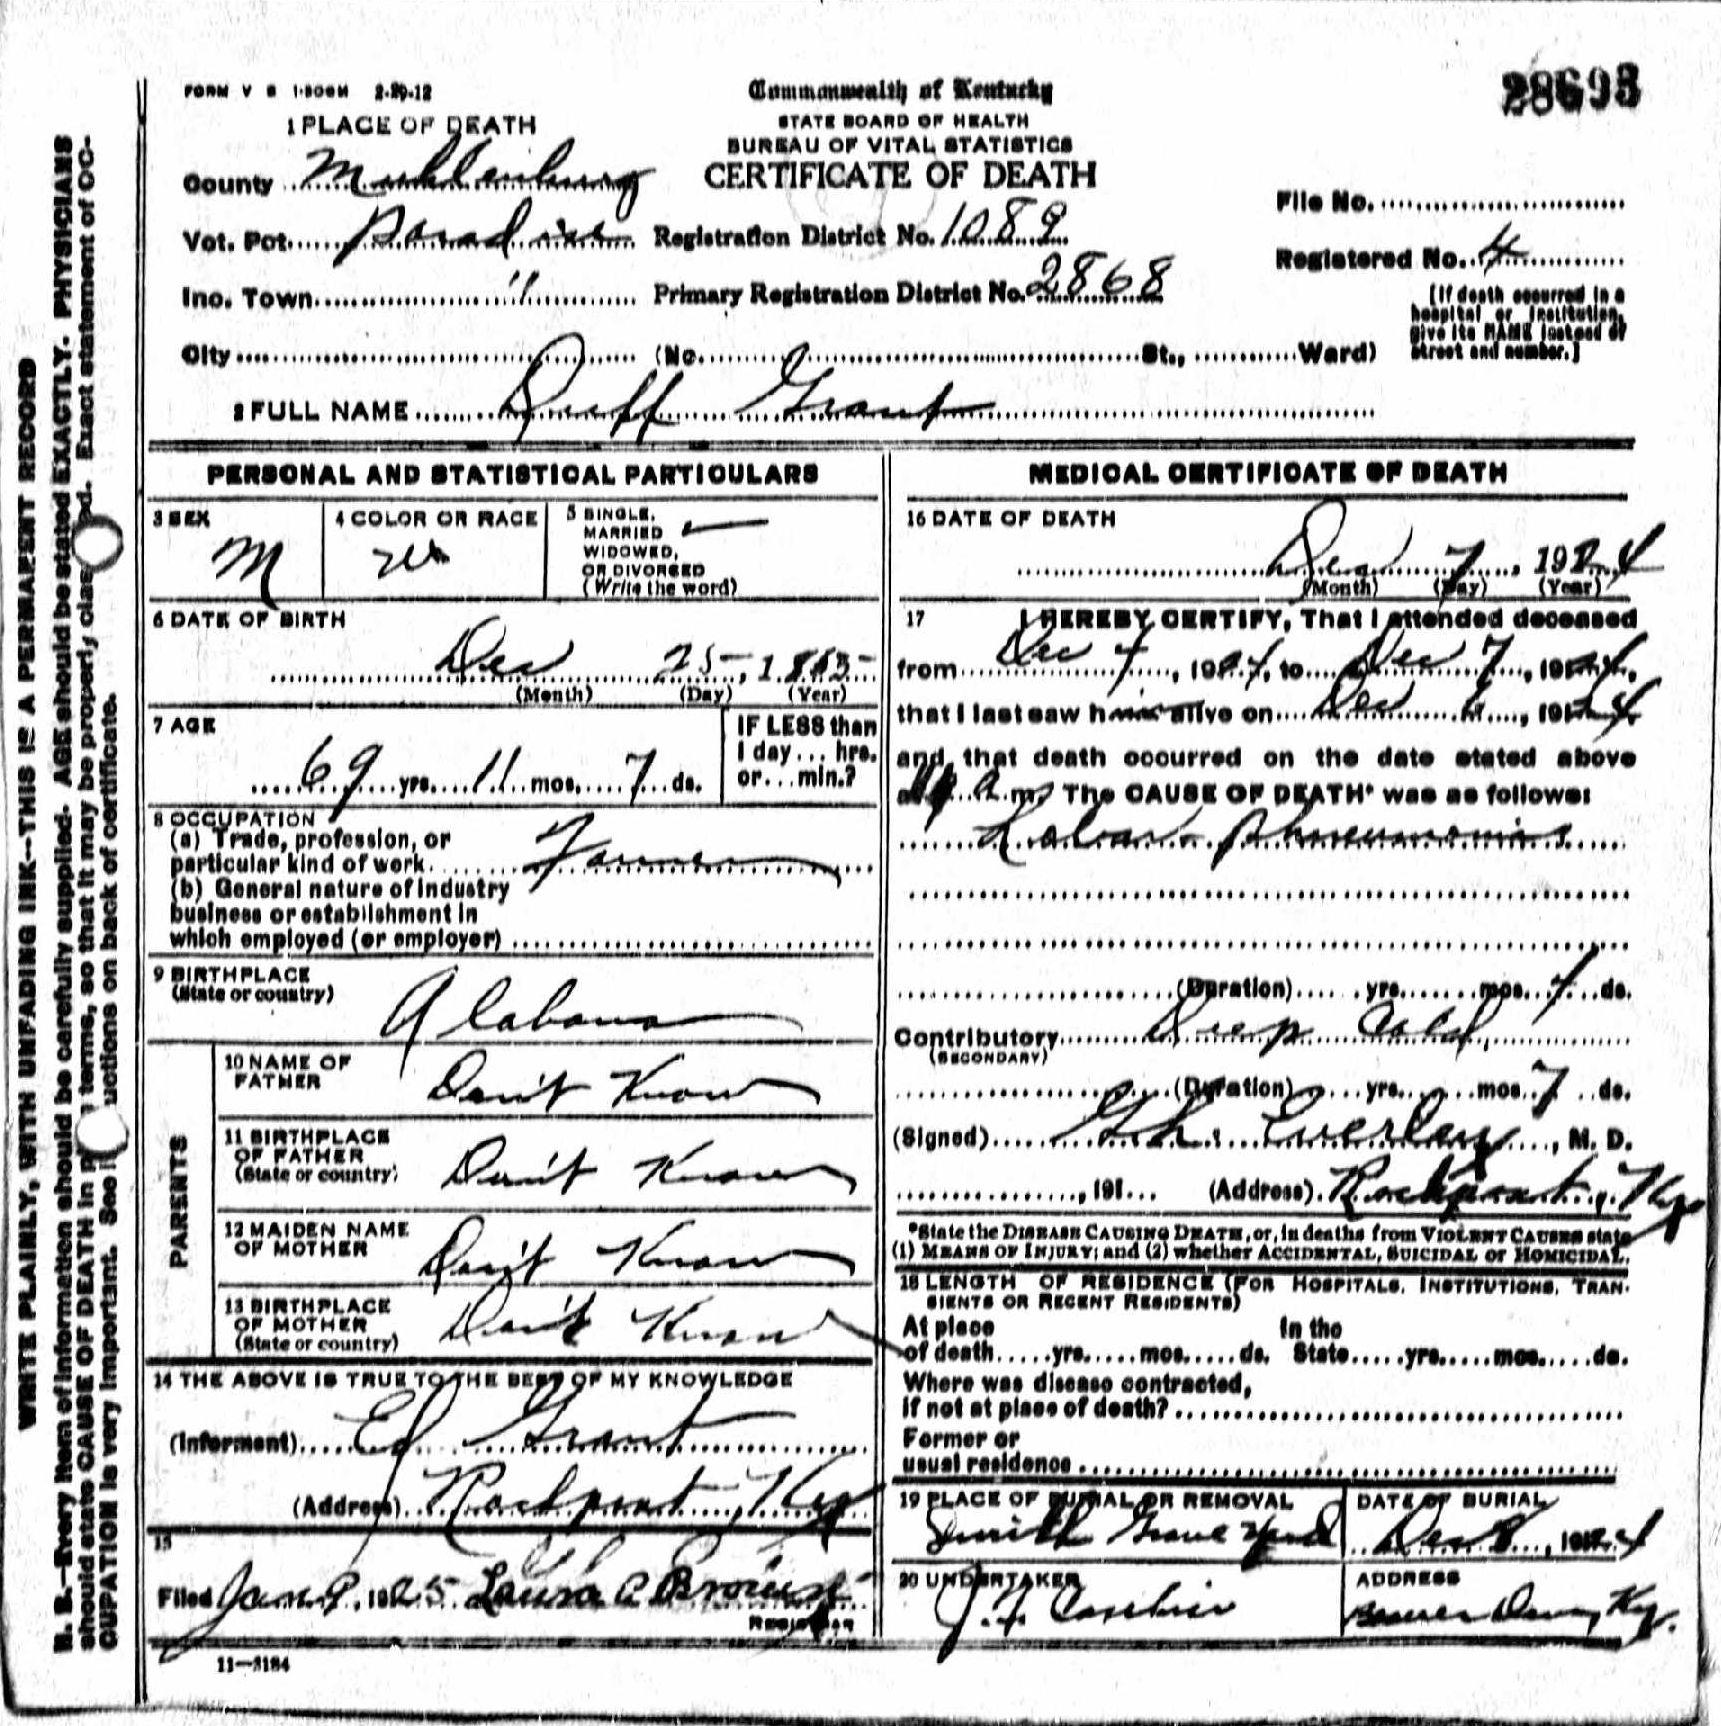 Death certificates gr kentucky death certificate 28693 duff grant 1865 1924 ed grant paradise rockport muhlenberg alabama kentucky smith xflitez Choice Image